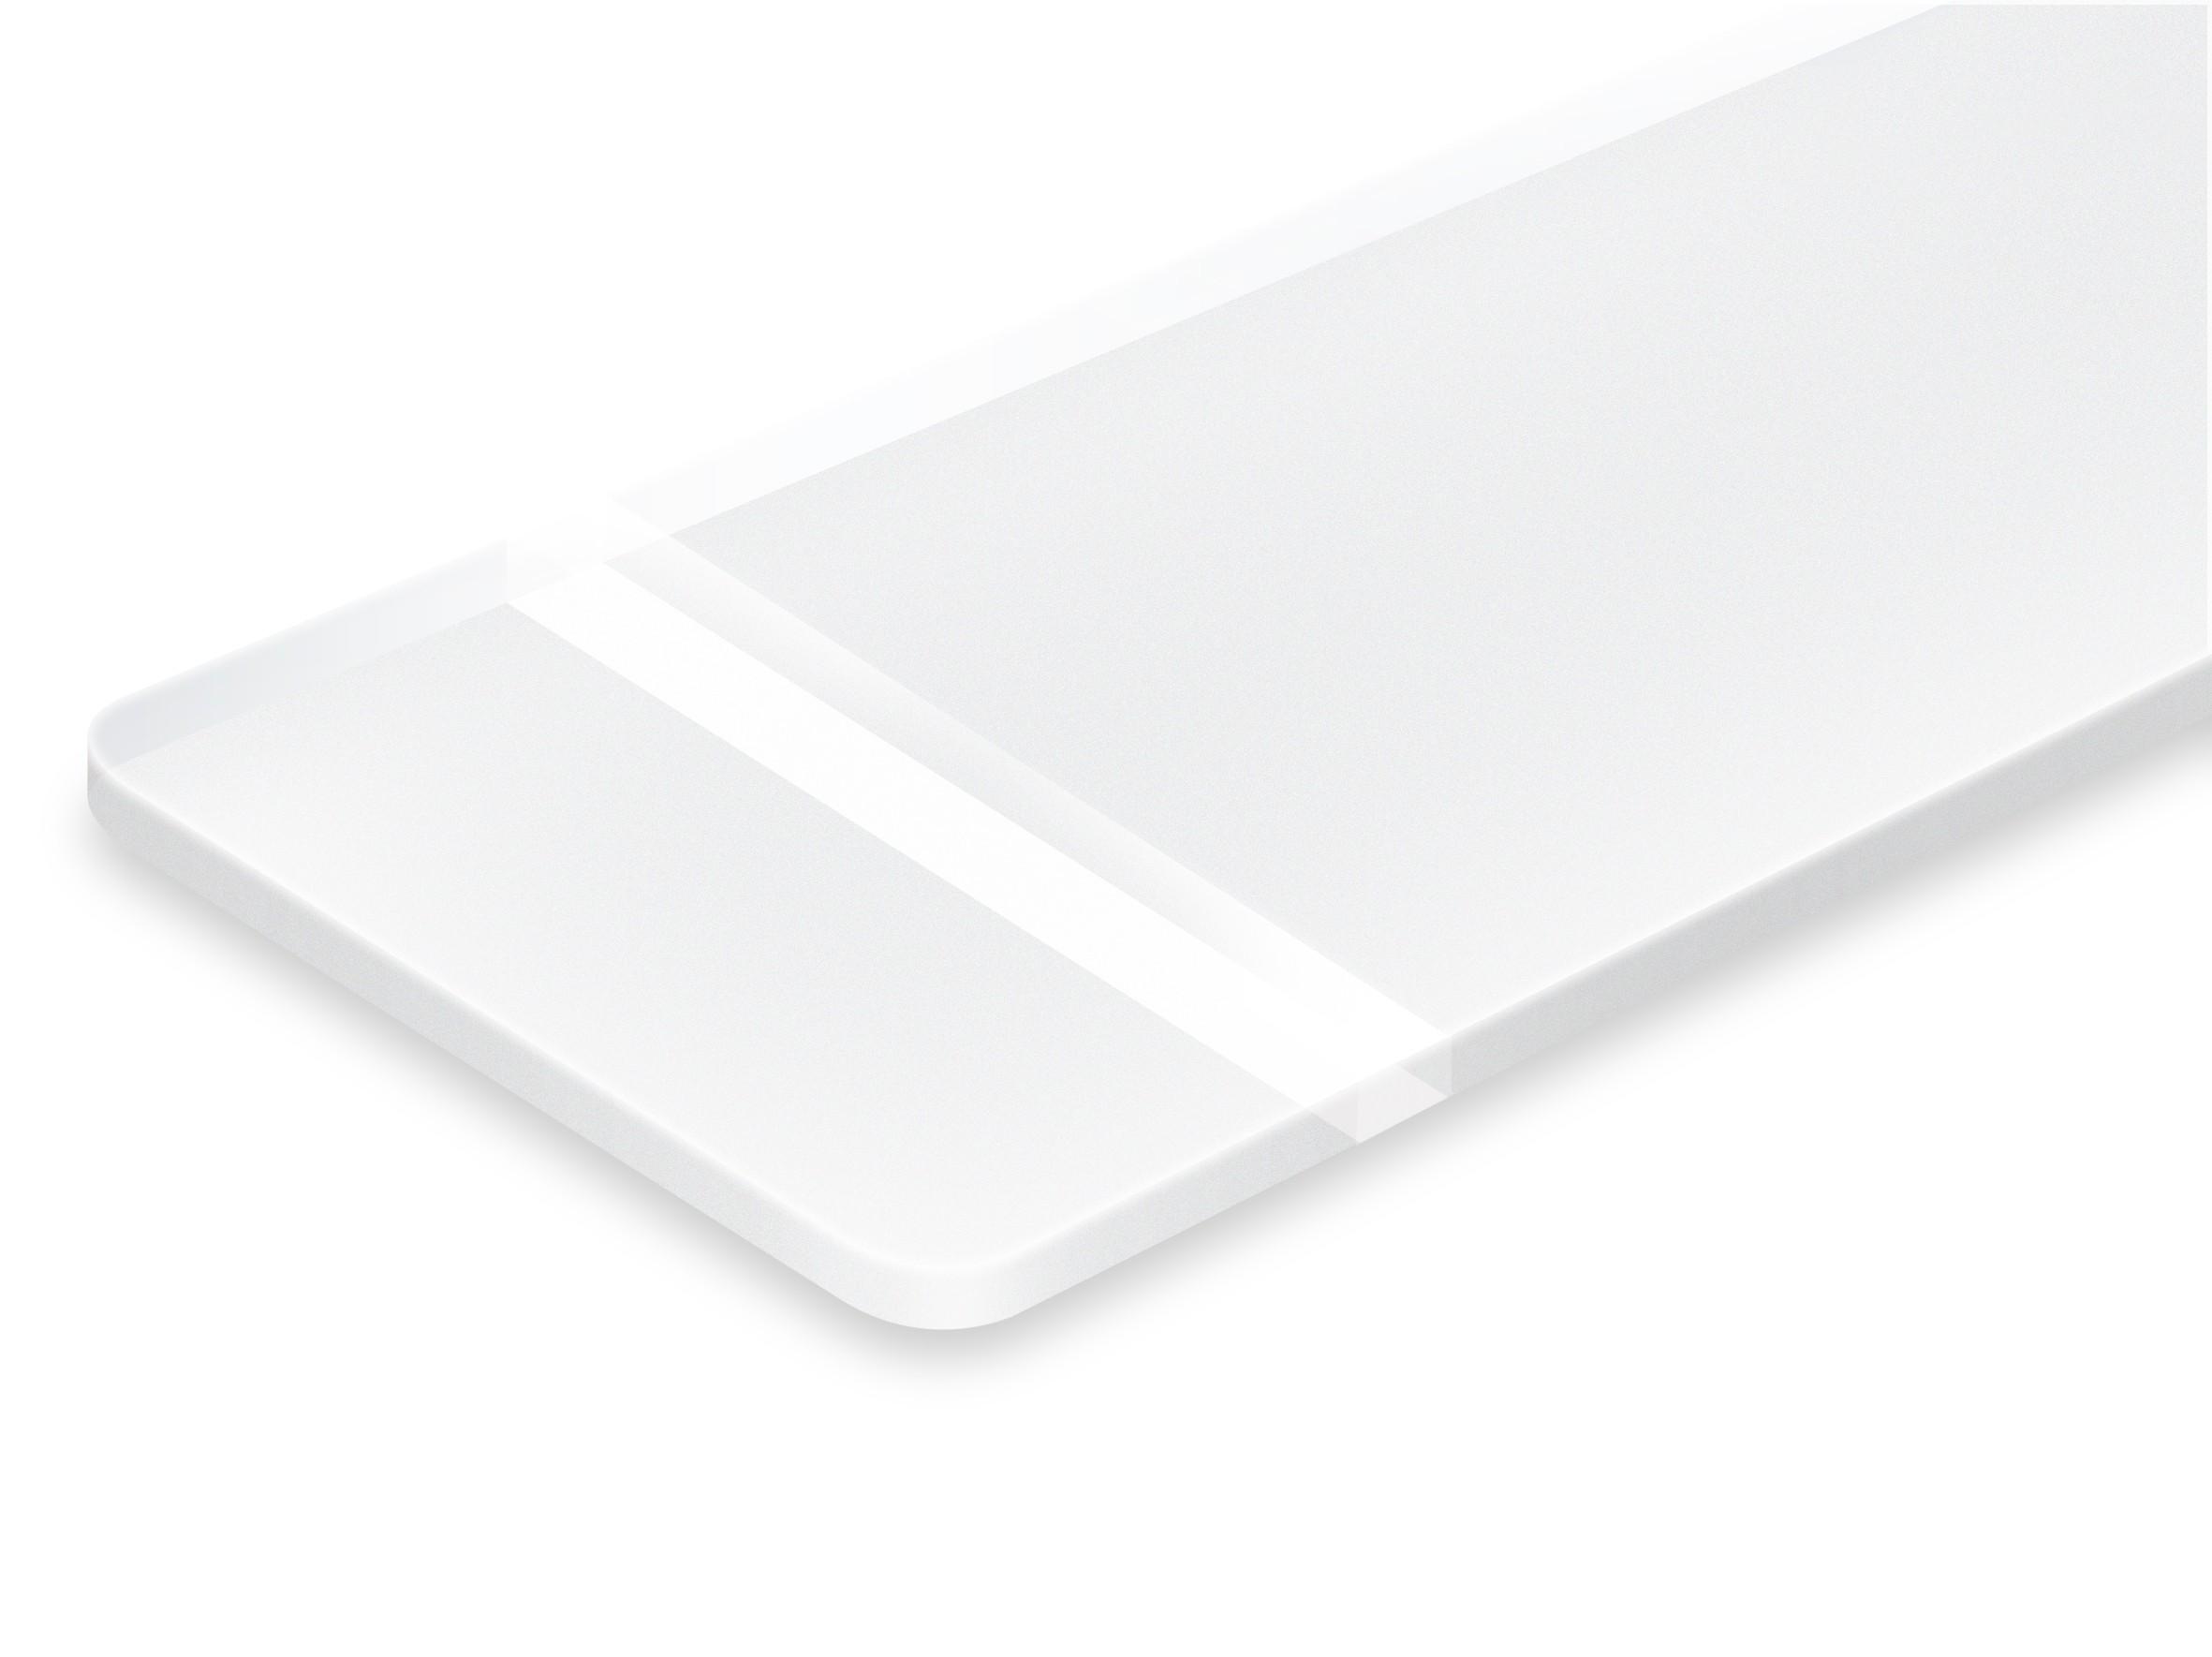 Trolase Reverse Transparent Acryl For Reverse Engraving